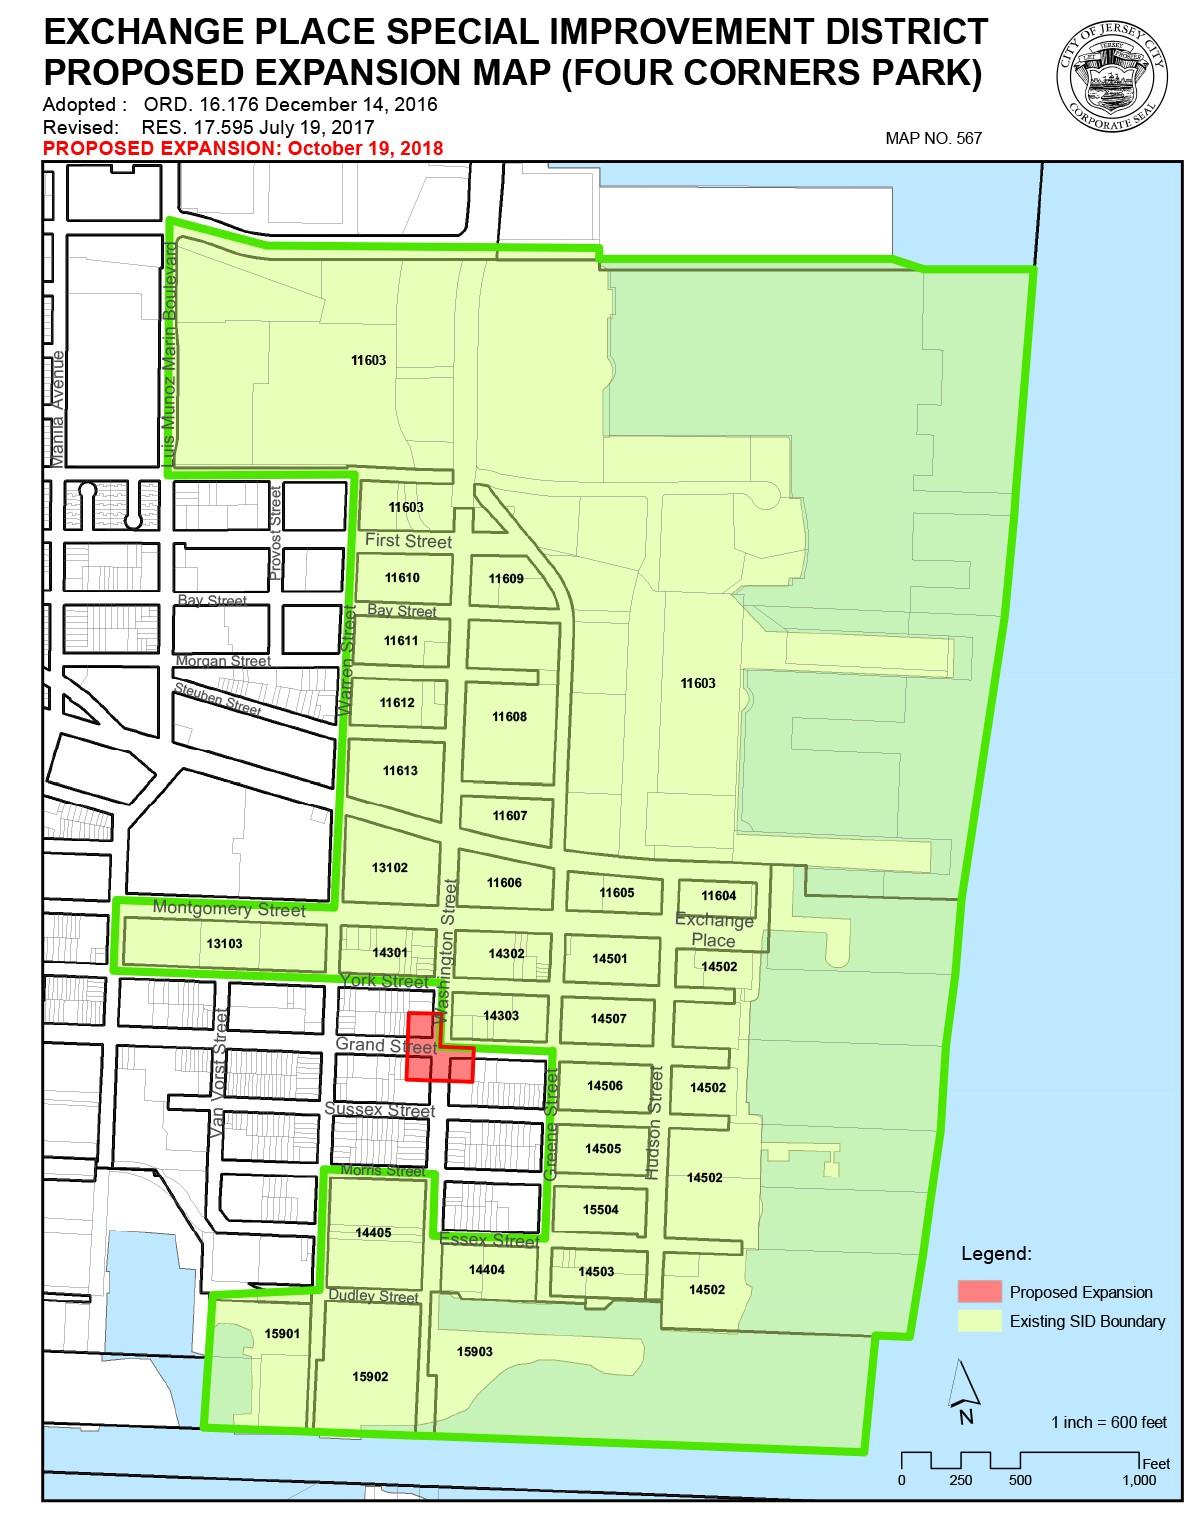 SID Map Boundaries Including 4 Corners Park.jpg